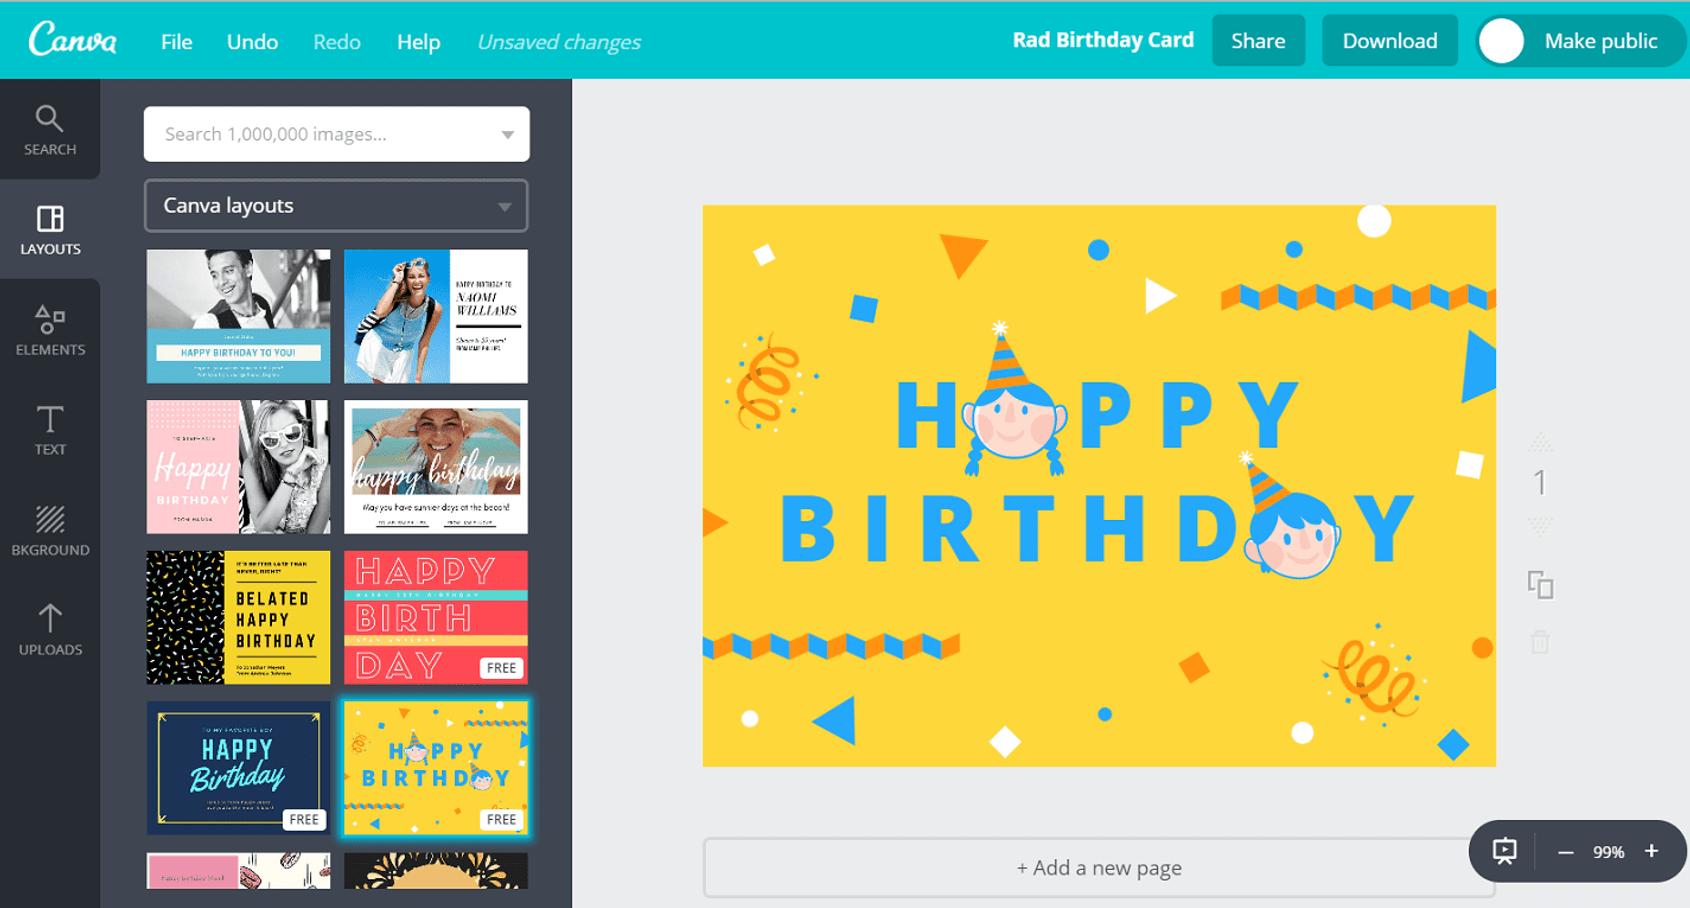 Free Birthday Greeting Card Maker (Add Photo & Name!) - Canva